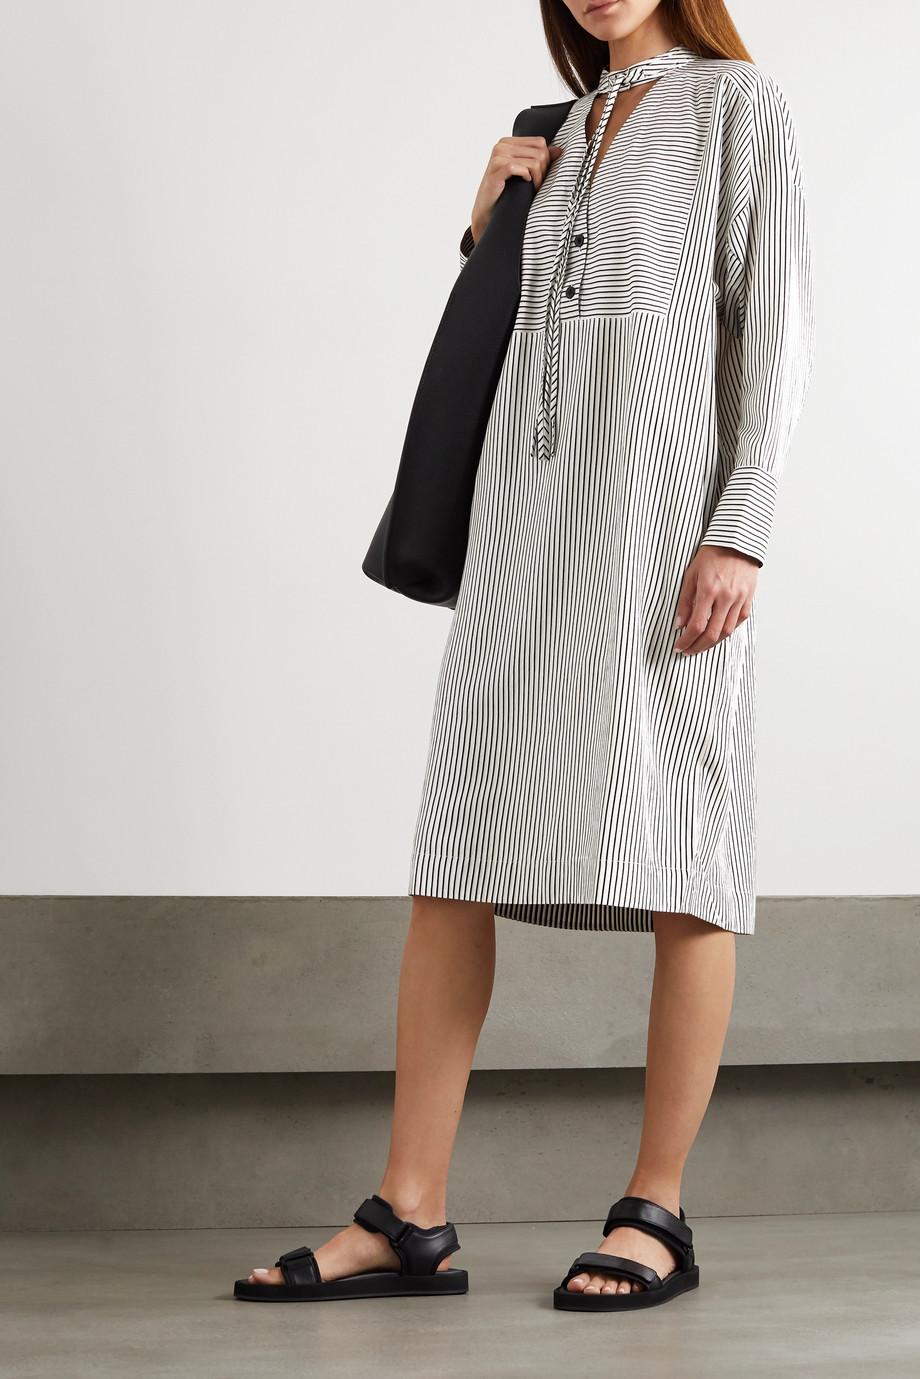 Proenza Schouler White Label 大廓形挖剪条纹绉纱长款上衣